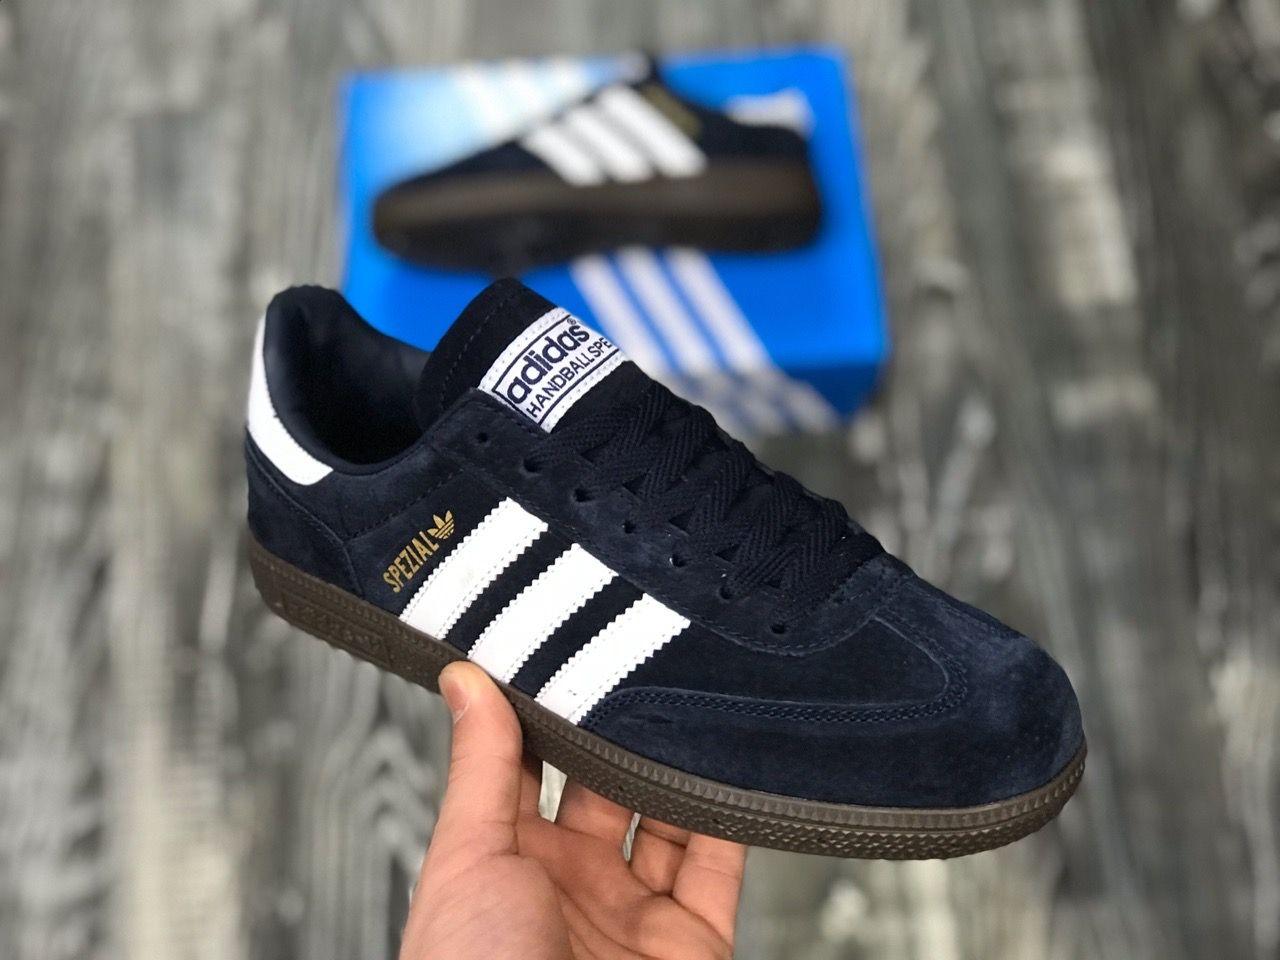 Adidas Spezial navy blue